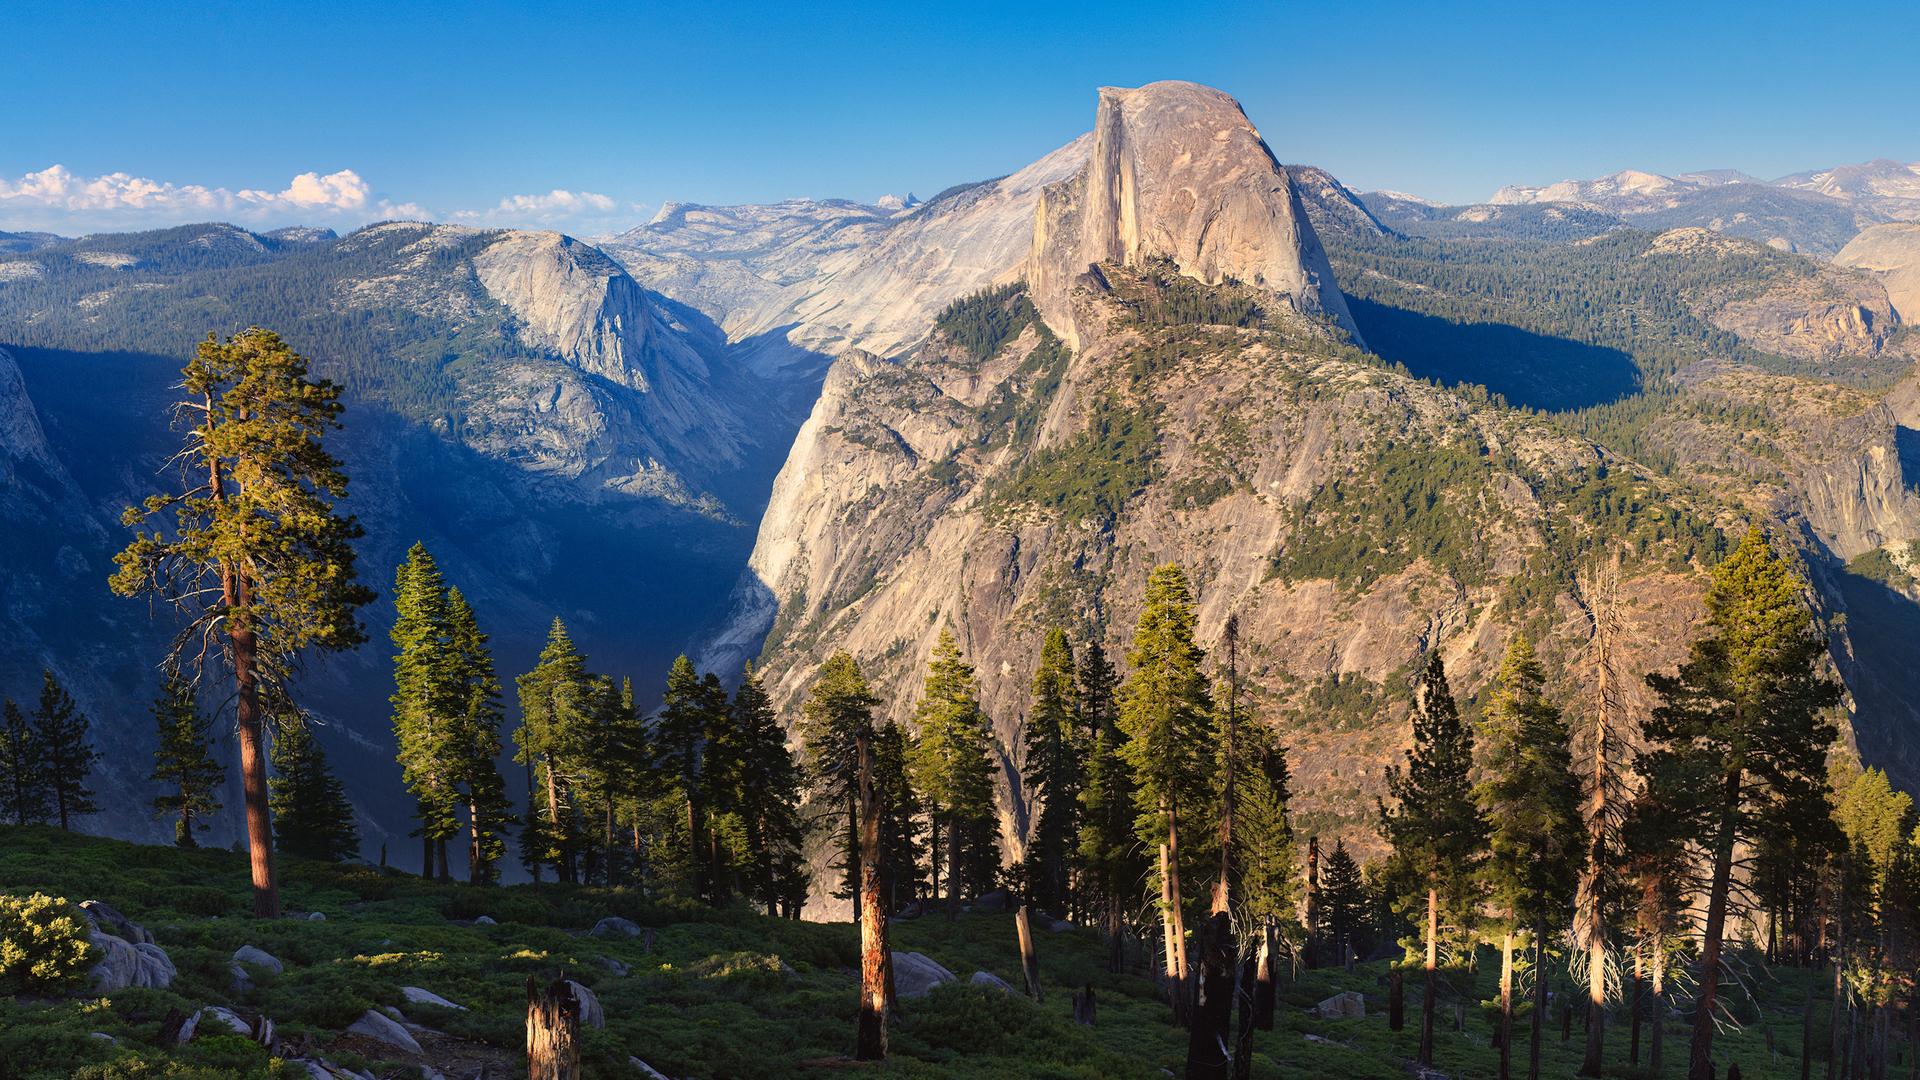 Yosemite National Park Wallpapers Digitalhintnet 1920x1080